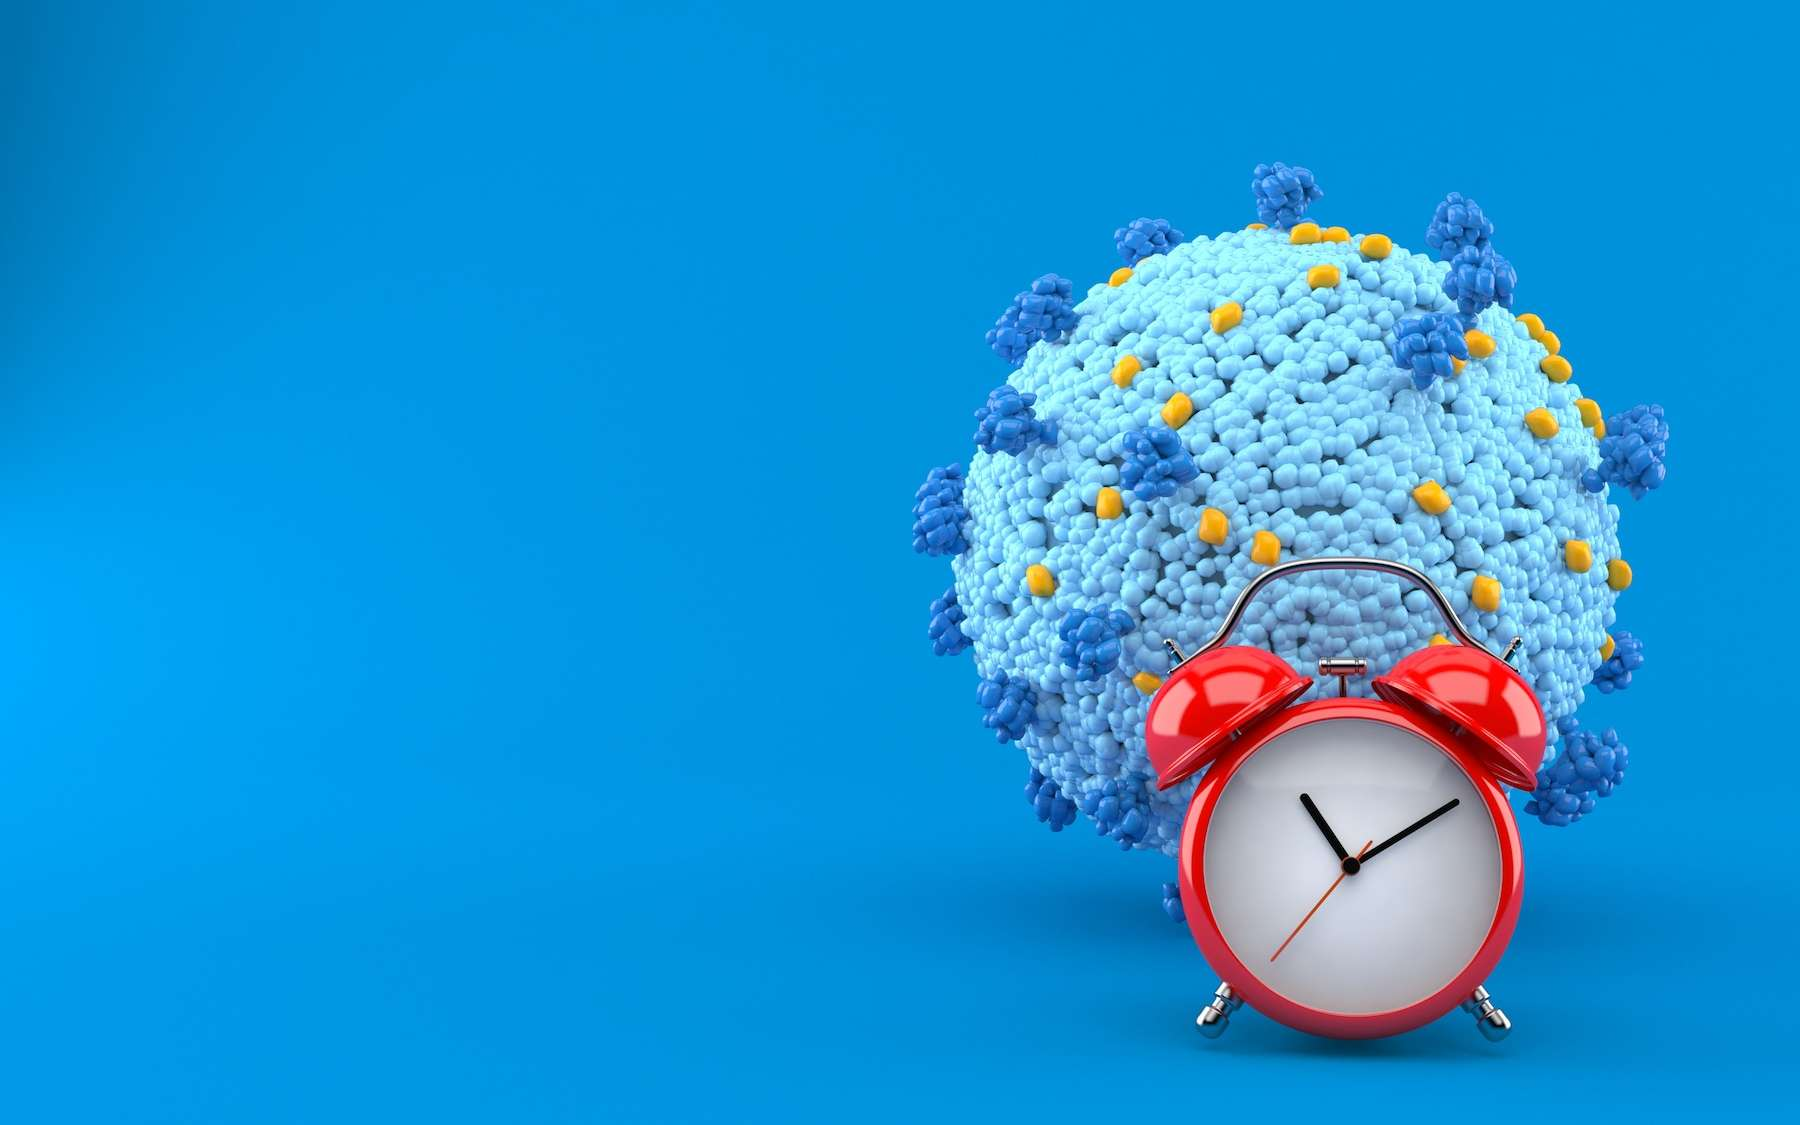 Quand interviendra la prochaine pandémie ? © Talaj, Adobe Stock